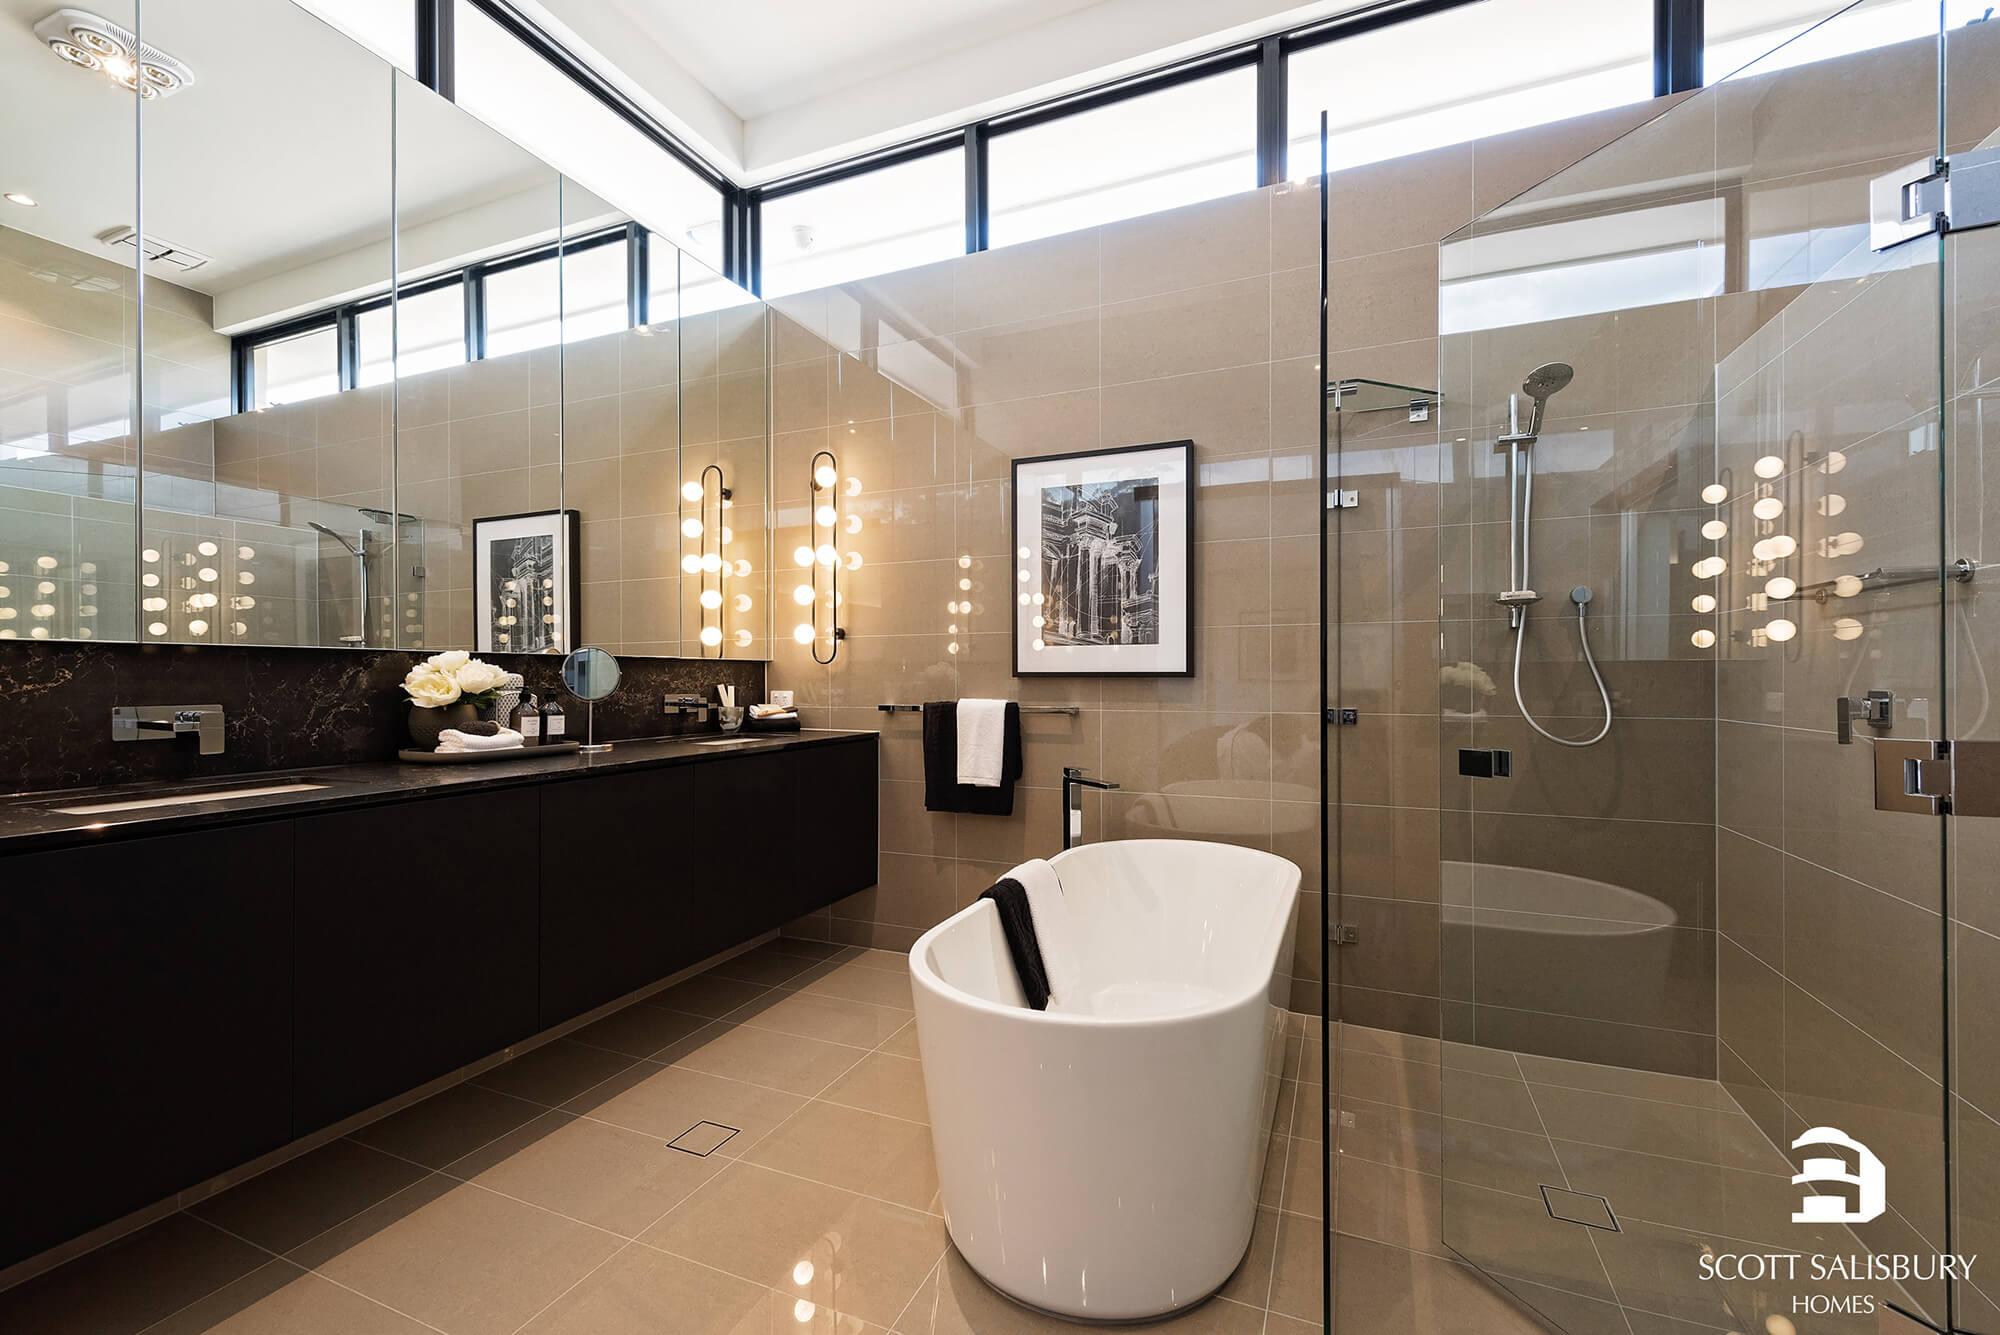 The Charleston bathroom